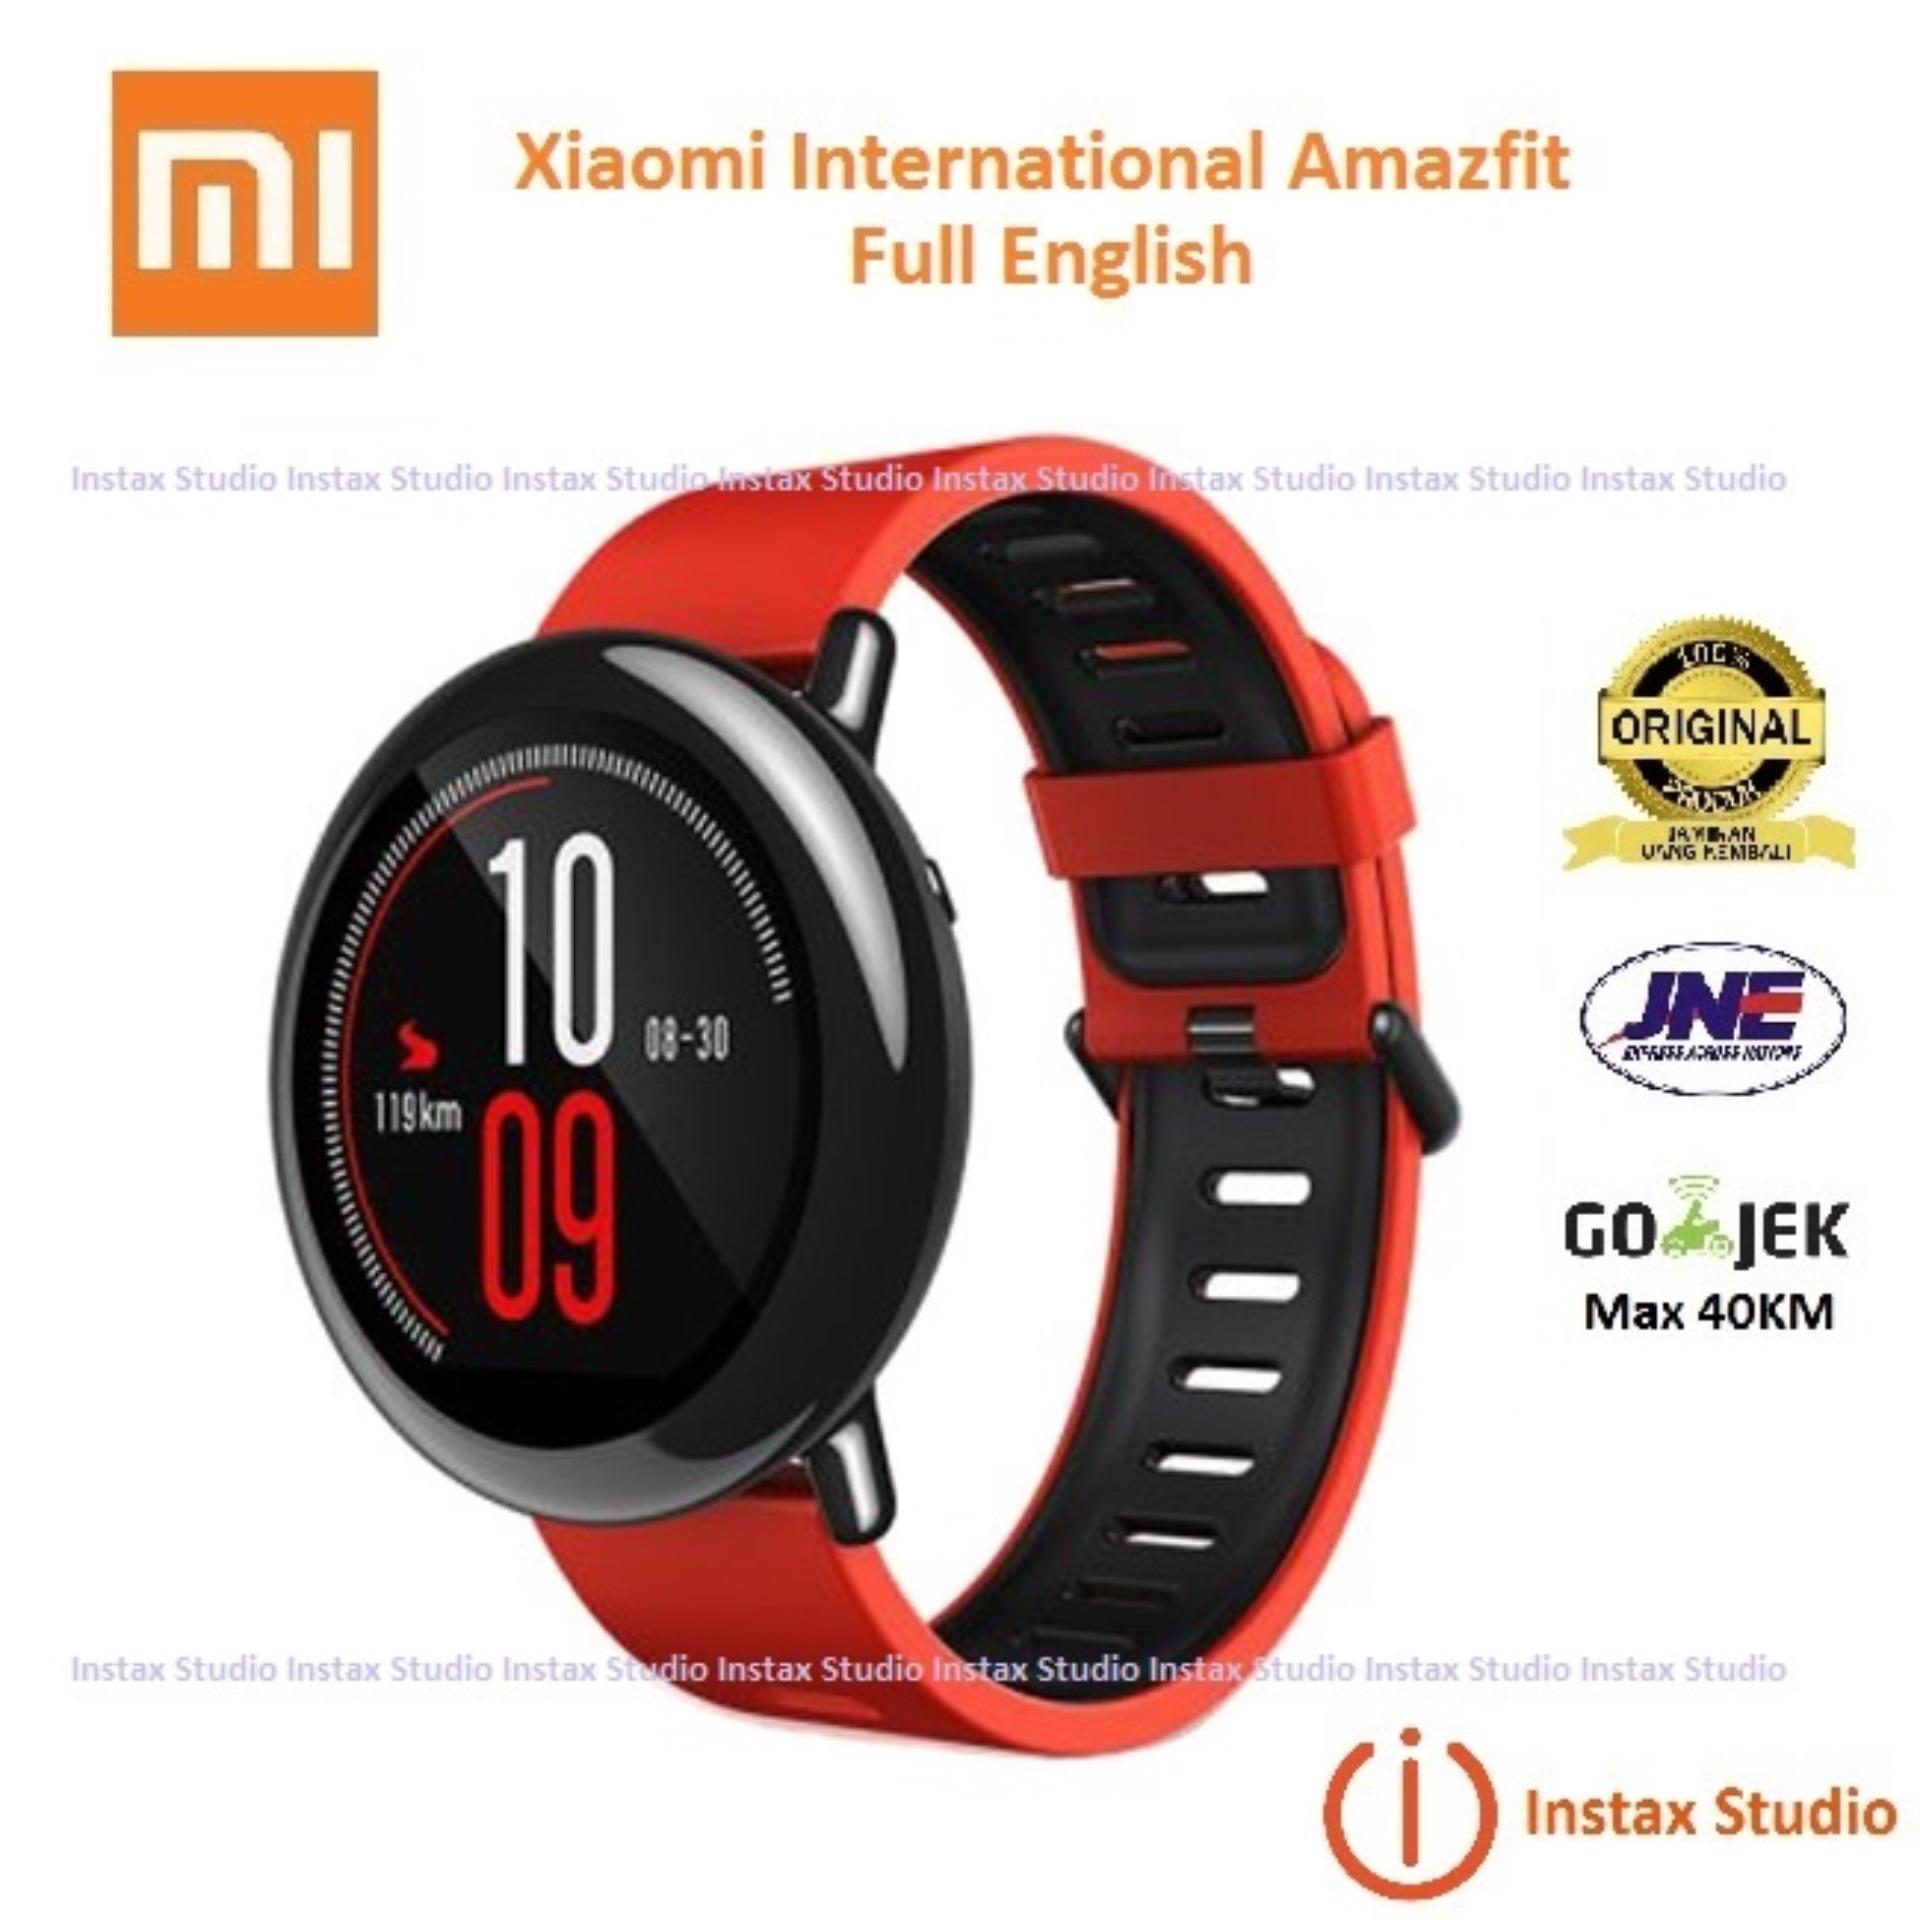 Xiaomi Amazfit Huami Gps Jam Tangan Sport Dengan Keramik Panel Merah Cor International Version Hitam Source Smartwatch With And Heart